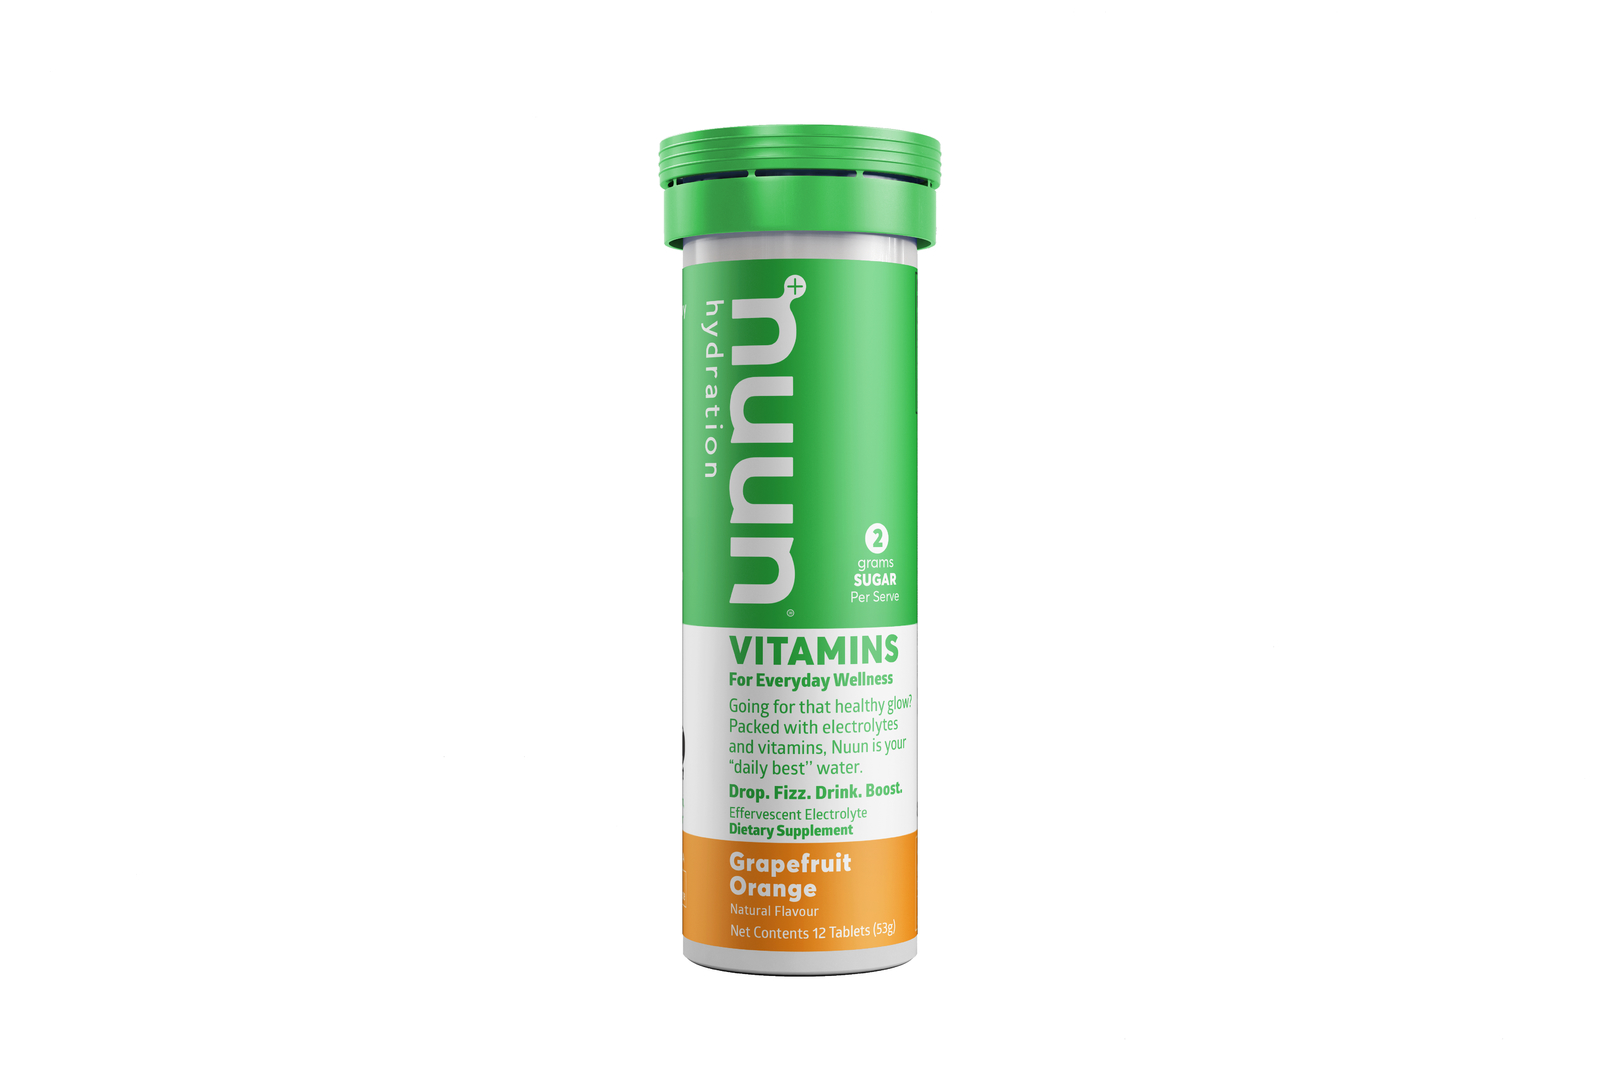 Nuun Vitamin Tablets - Grapefruit Orange image